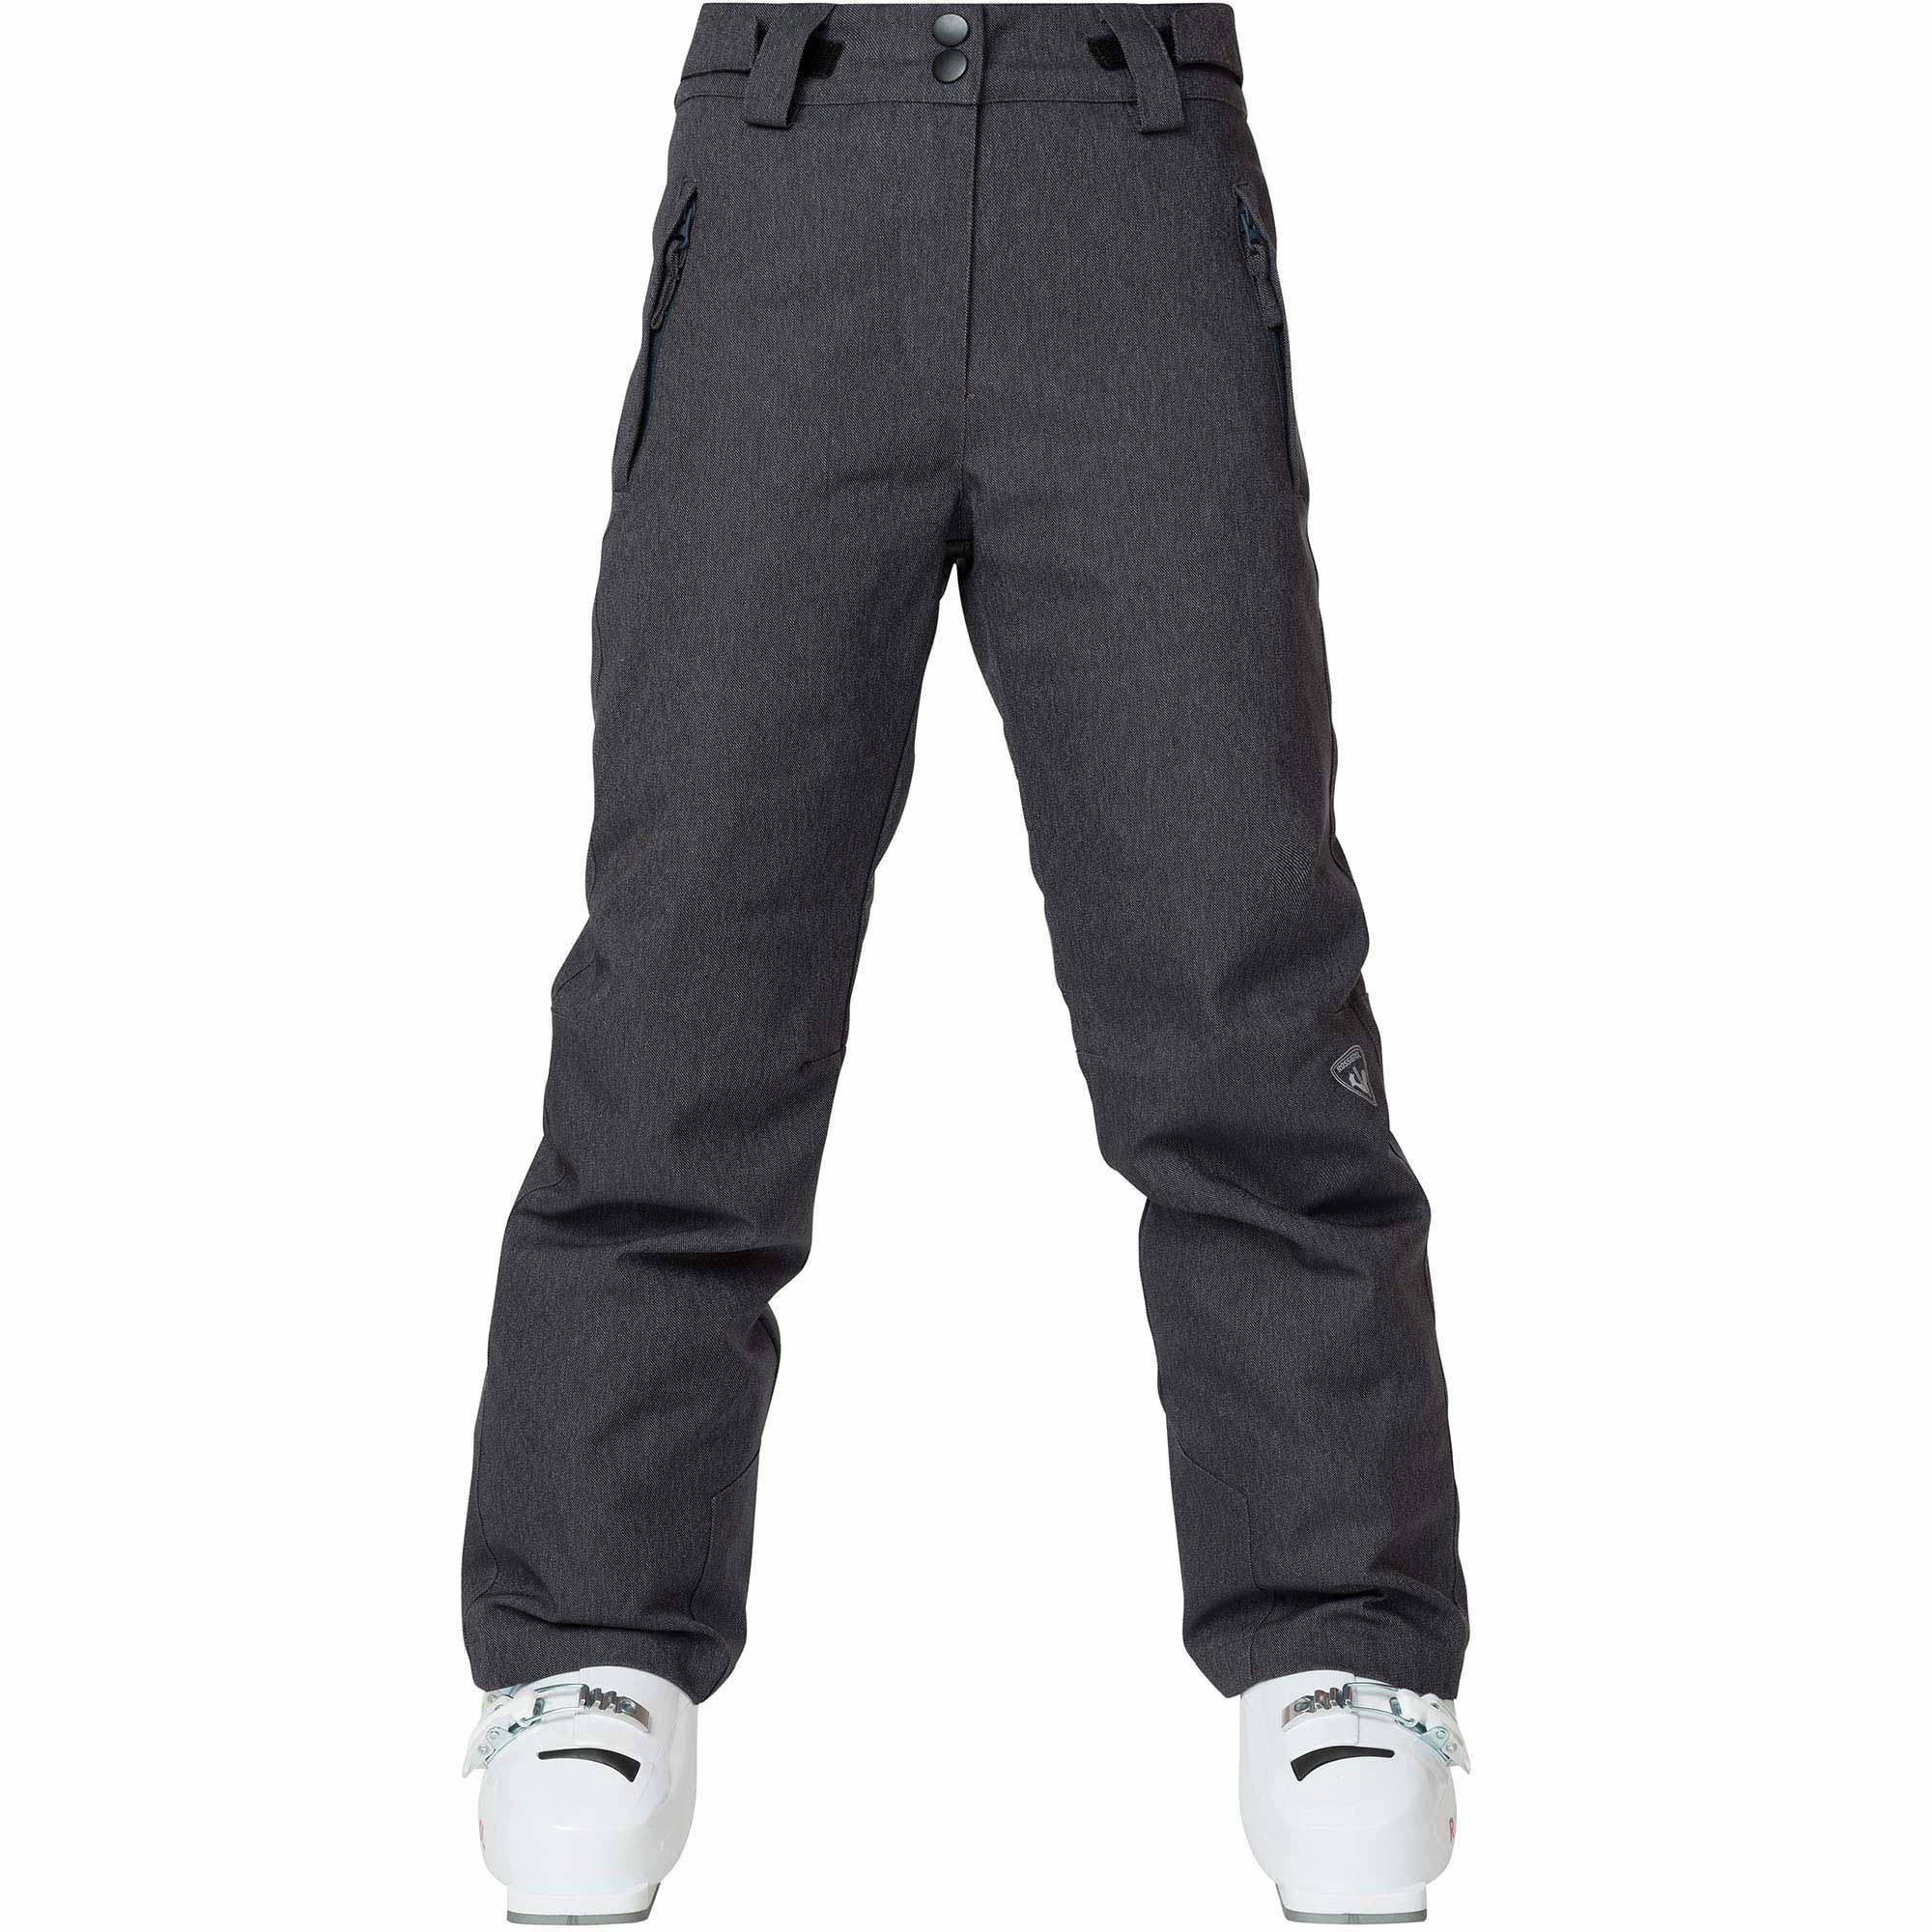 77647cba28e0 Pantalon De Ski Junior Rossignol Girl Ski Denim Pant - PRECISION SKI